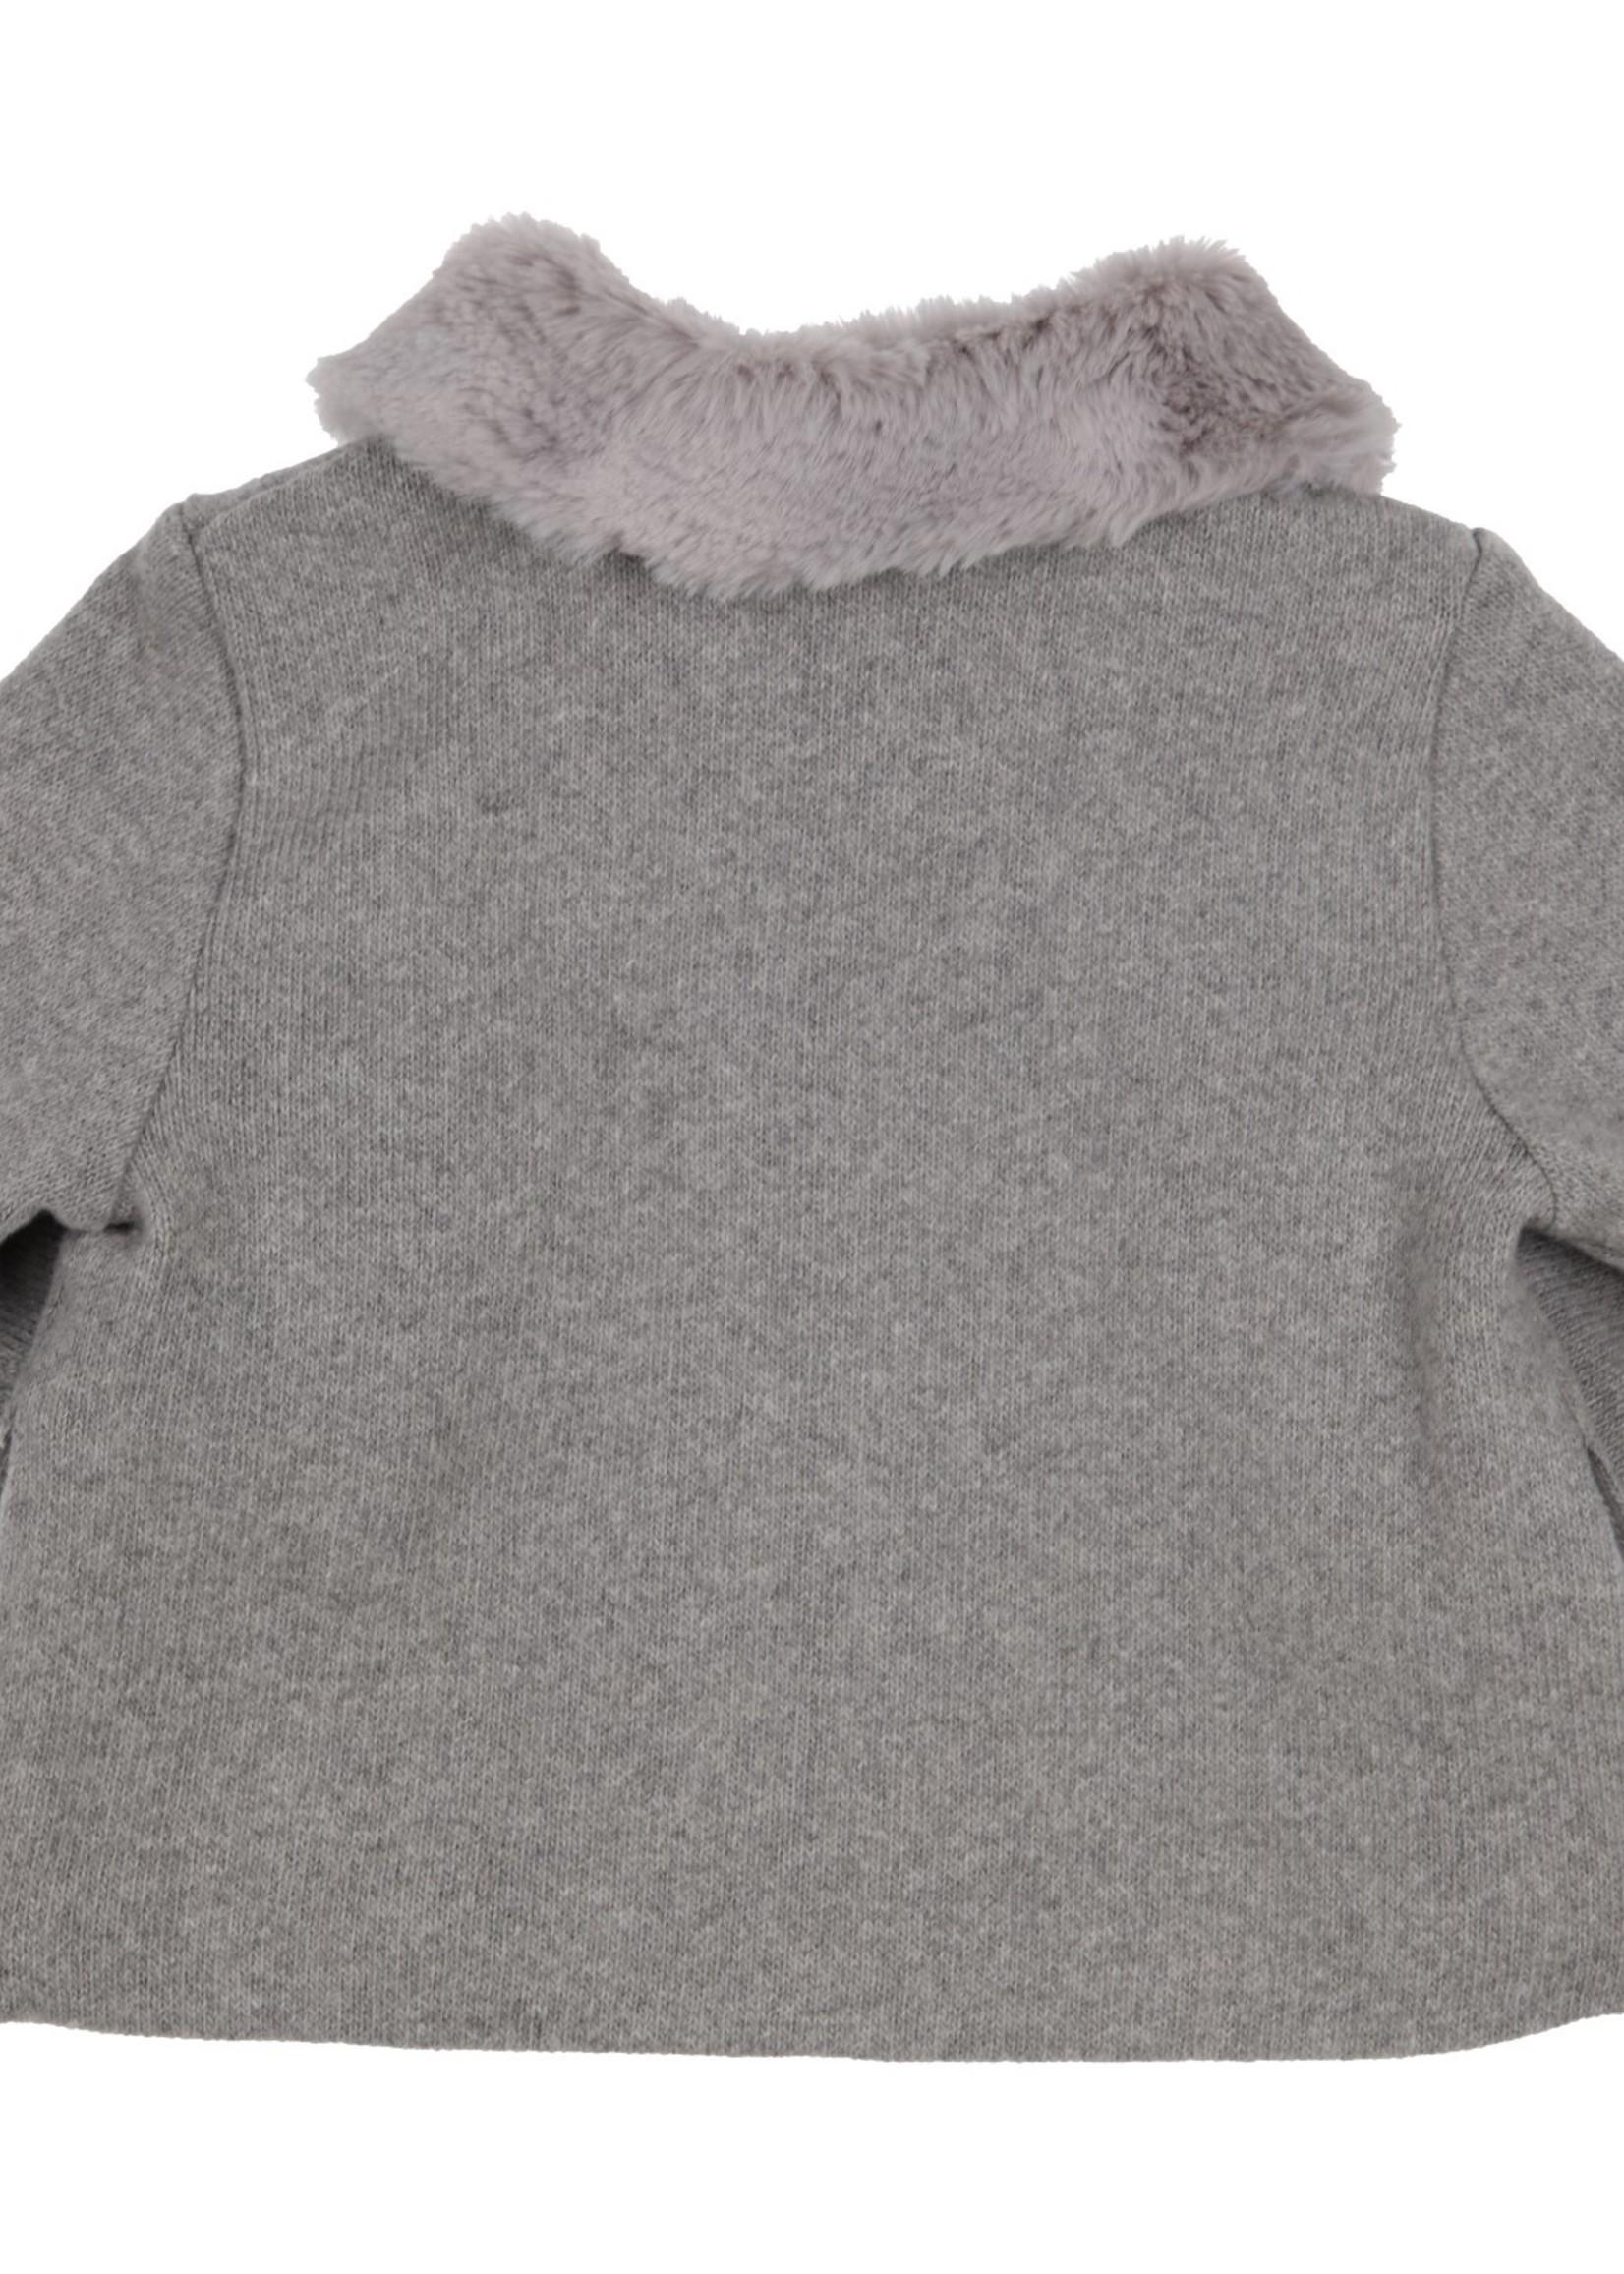 Gymp Gymp cardigan zipper combi (fake) fur grijs